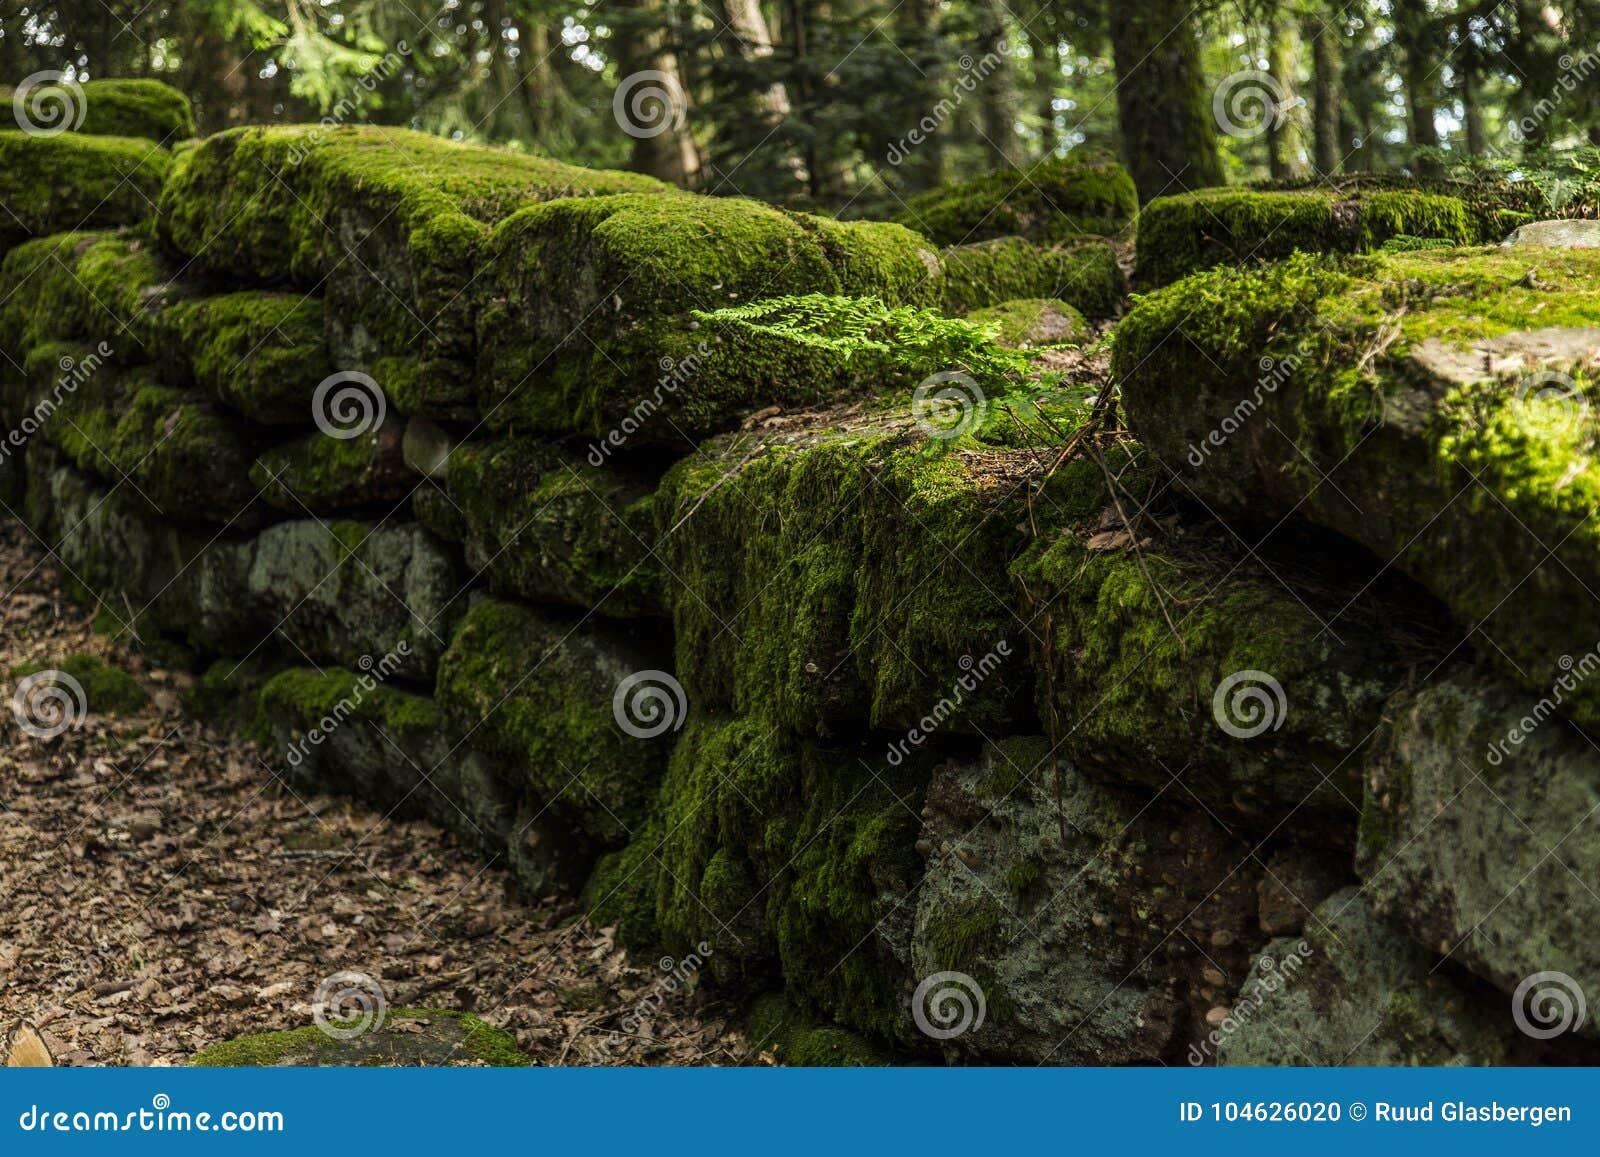 The Pagan Wall, Mont Sainte Odile, Ottrott, Alsage, France